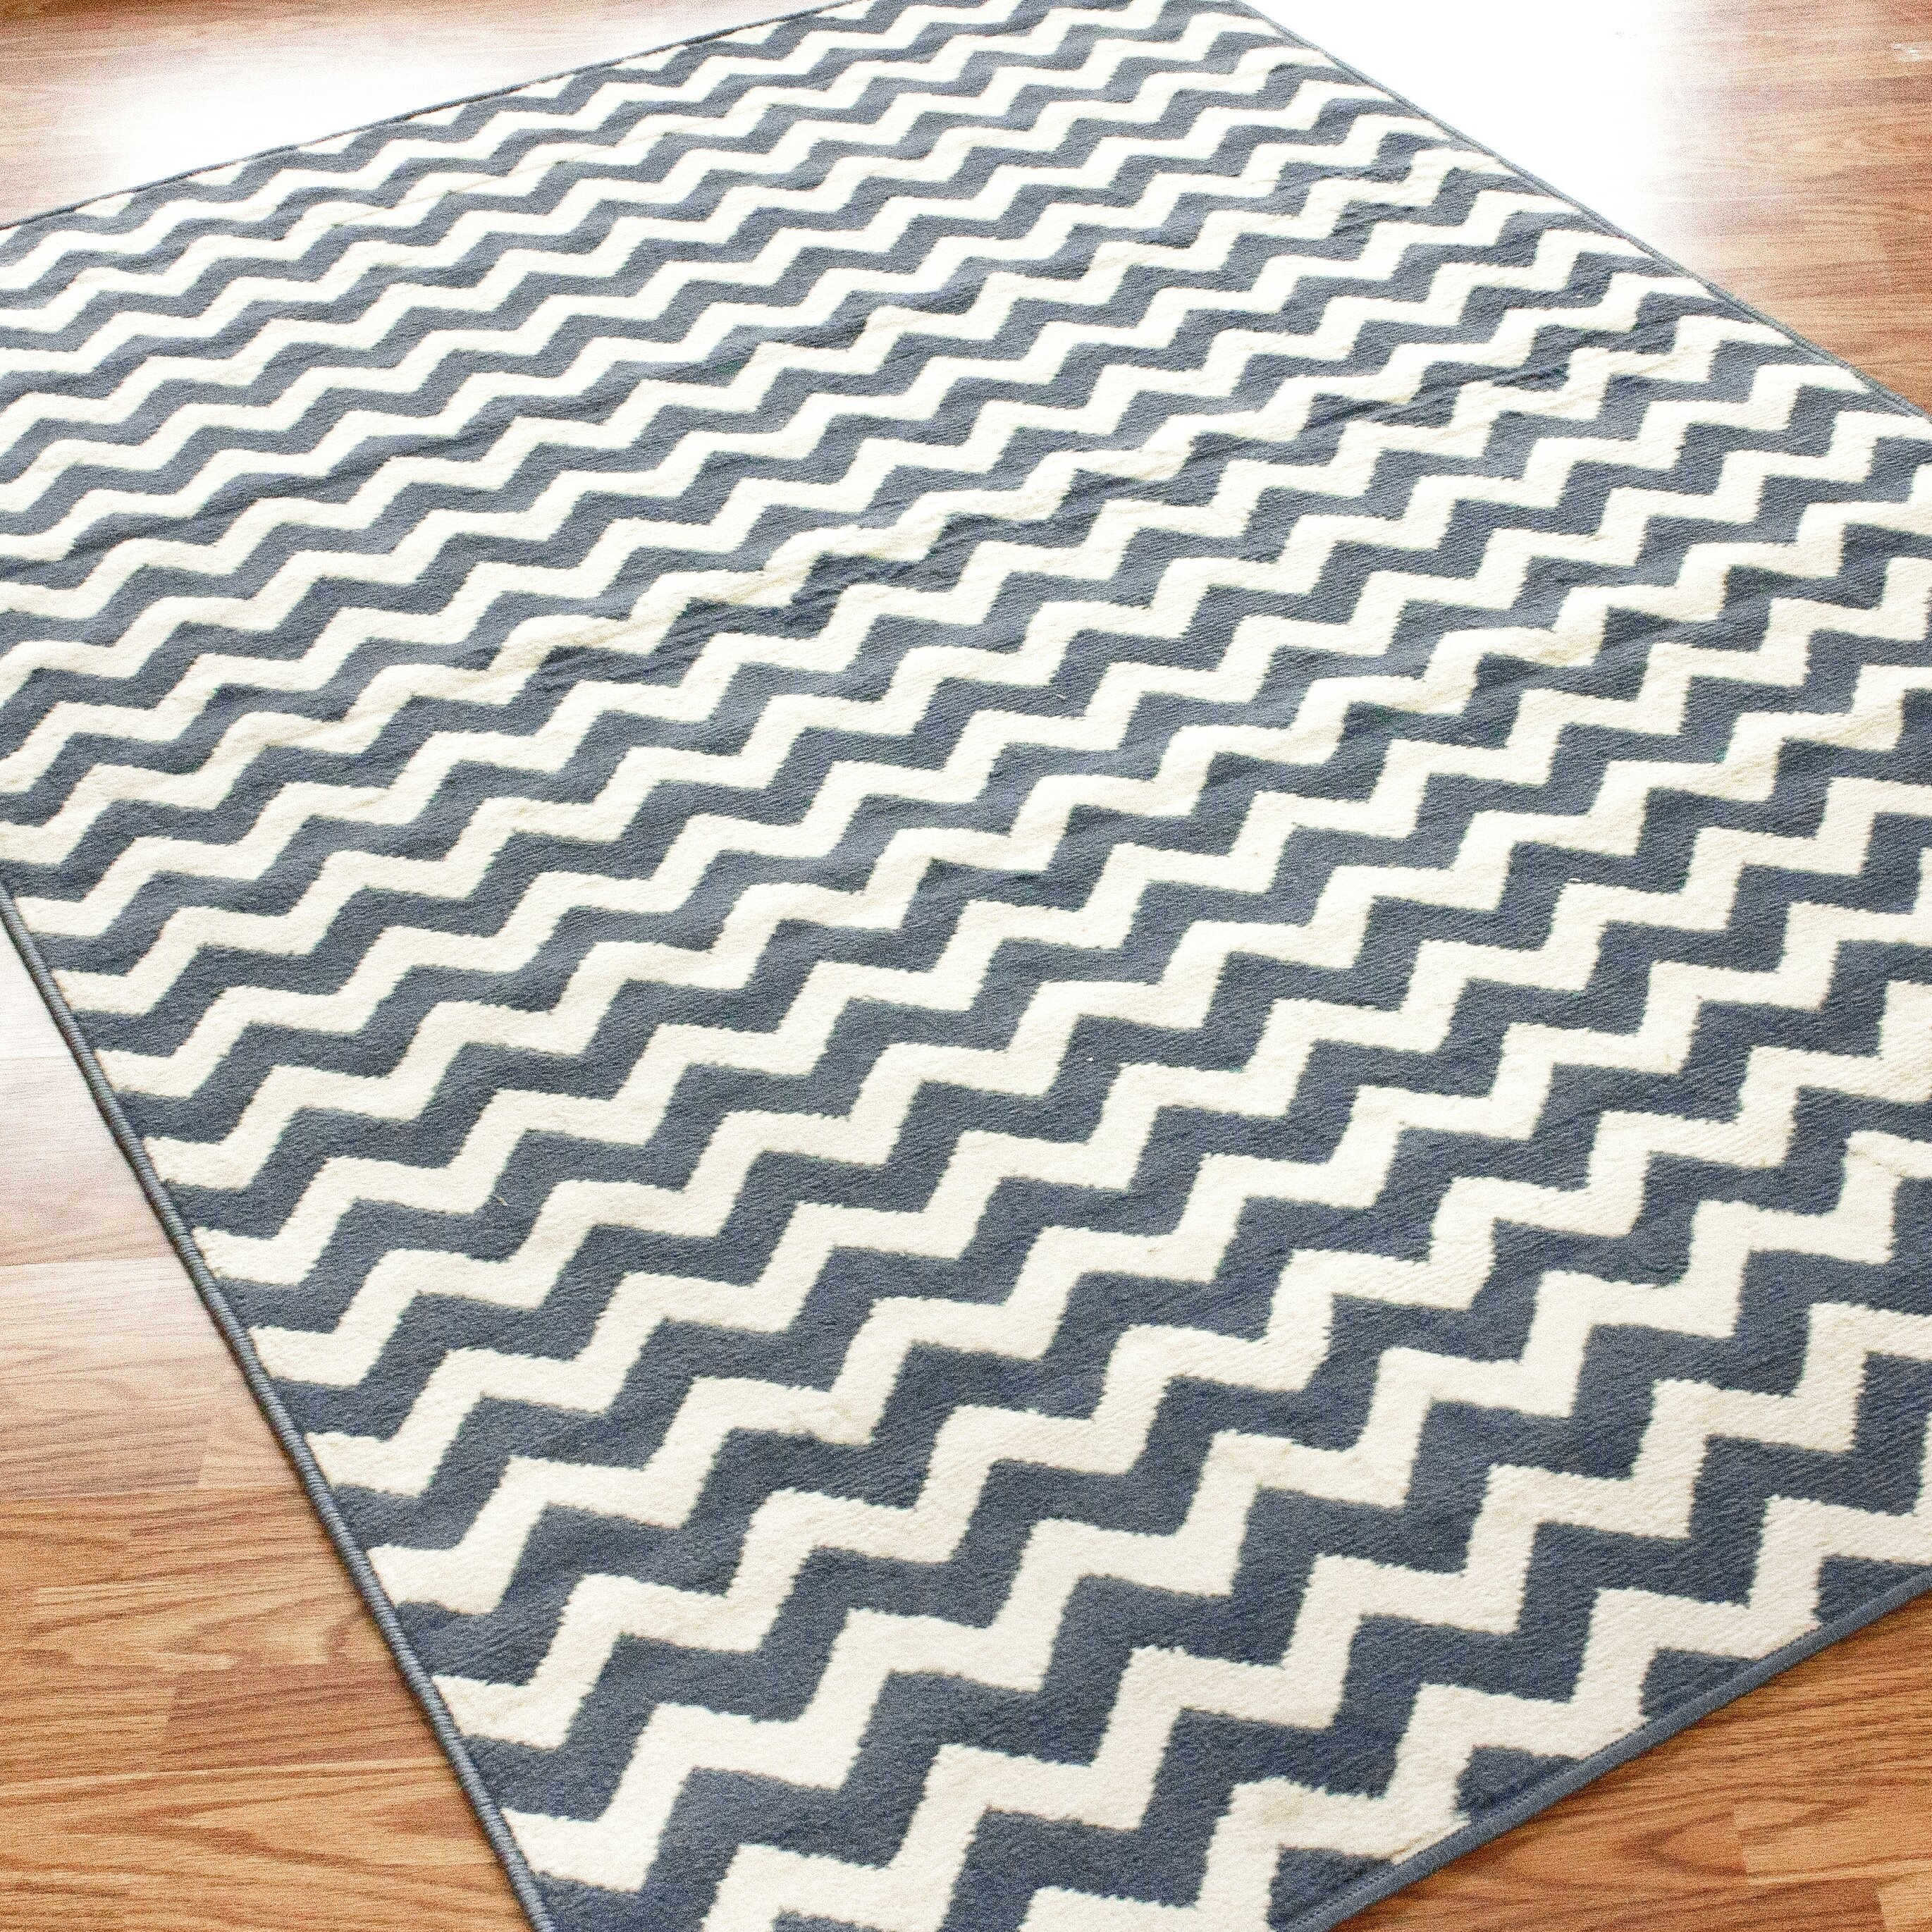 blue chevron rug  roselawnlutheran - nuloom poise chevron light blue area rug